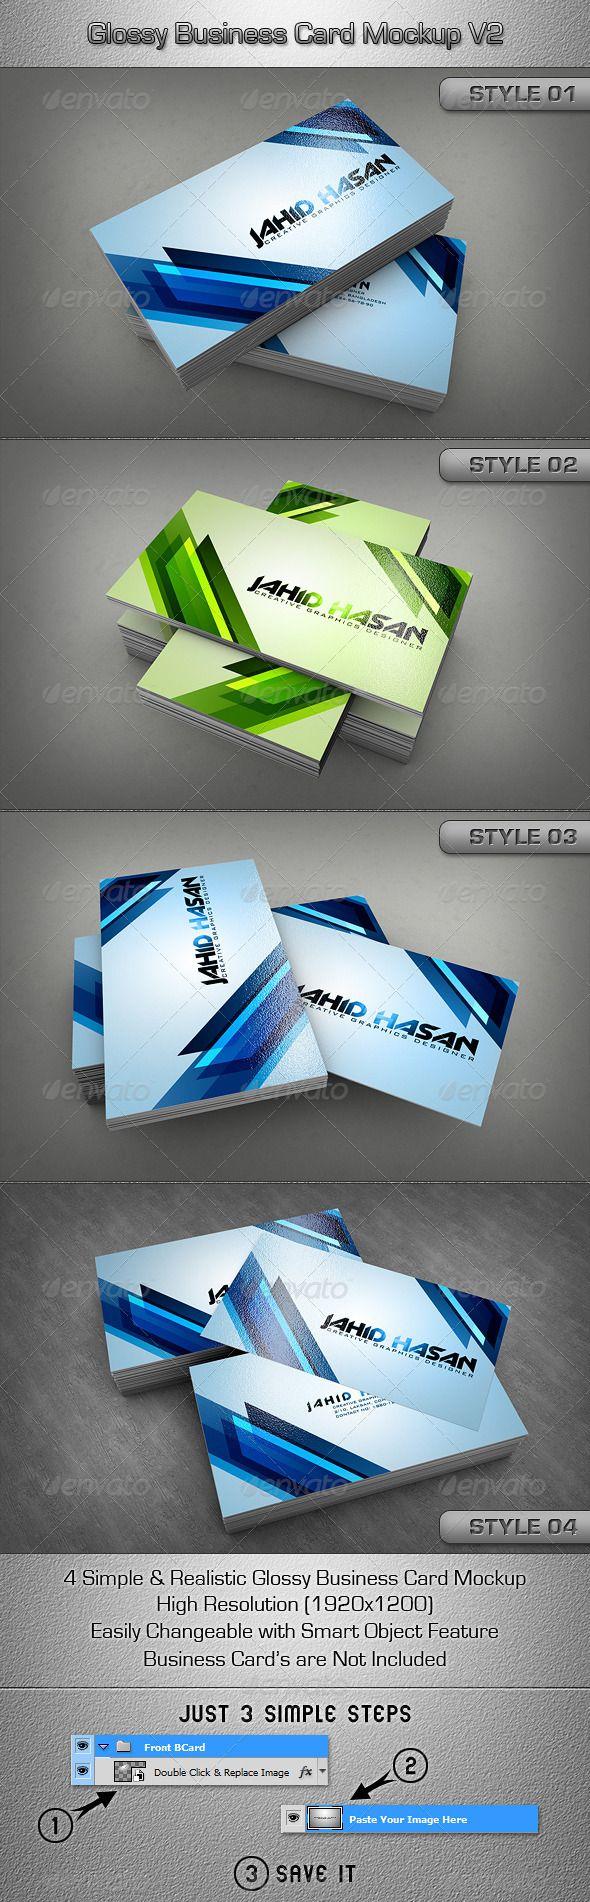 717 best business card mockup images on pinterest fonts glossy business card mockup v2 magicingreecefo Gallery